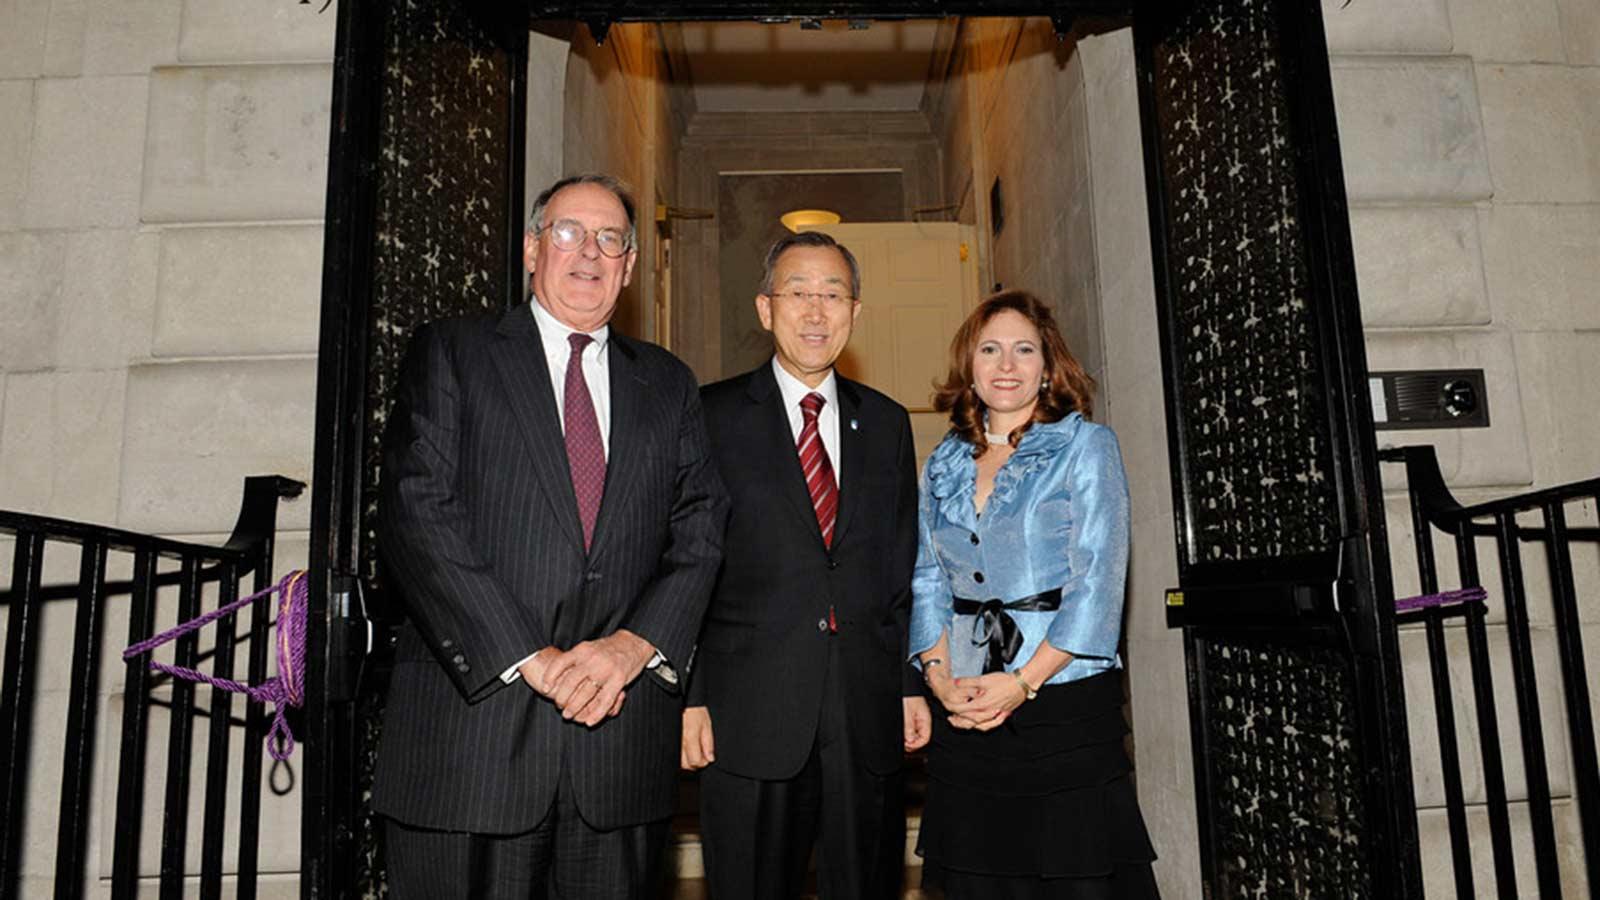 UN Secretary General Ban Ki-moon with President Raab